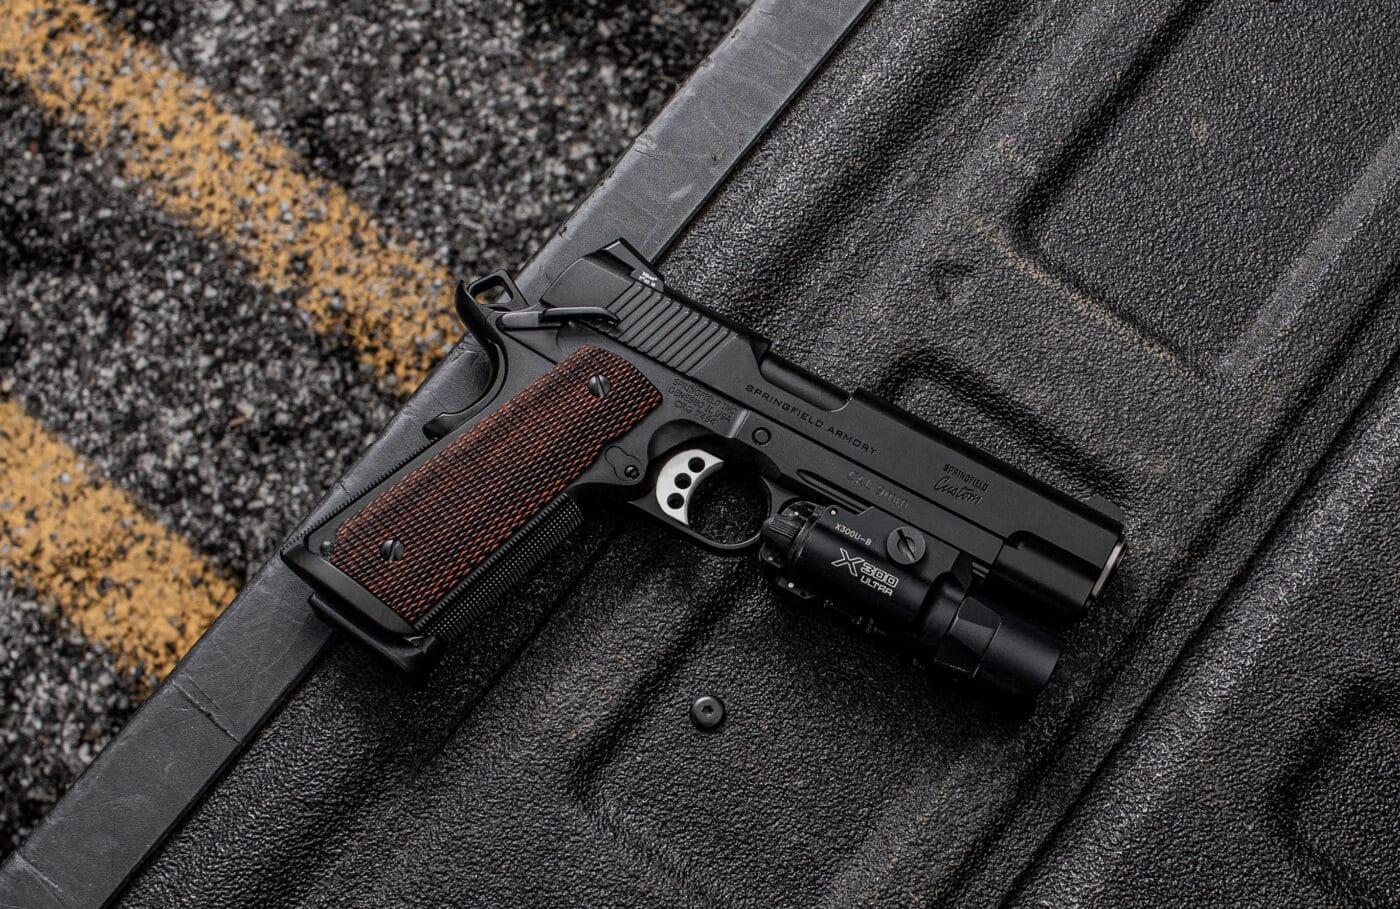 Springfield Armory Professional Light Rail 9mm pistol